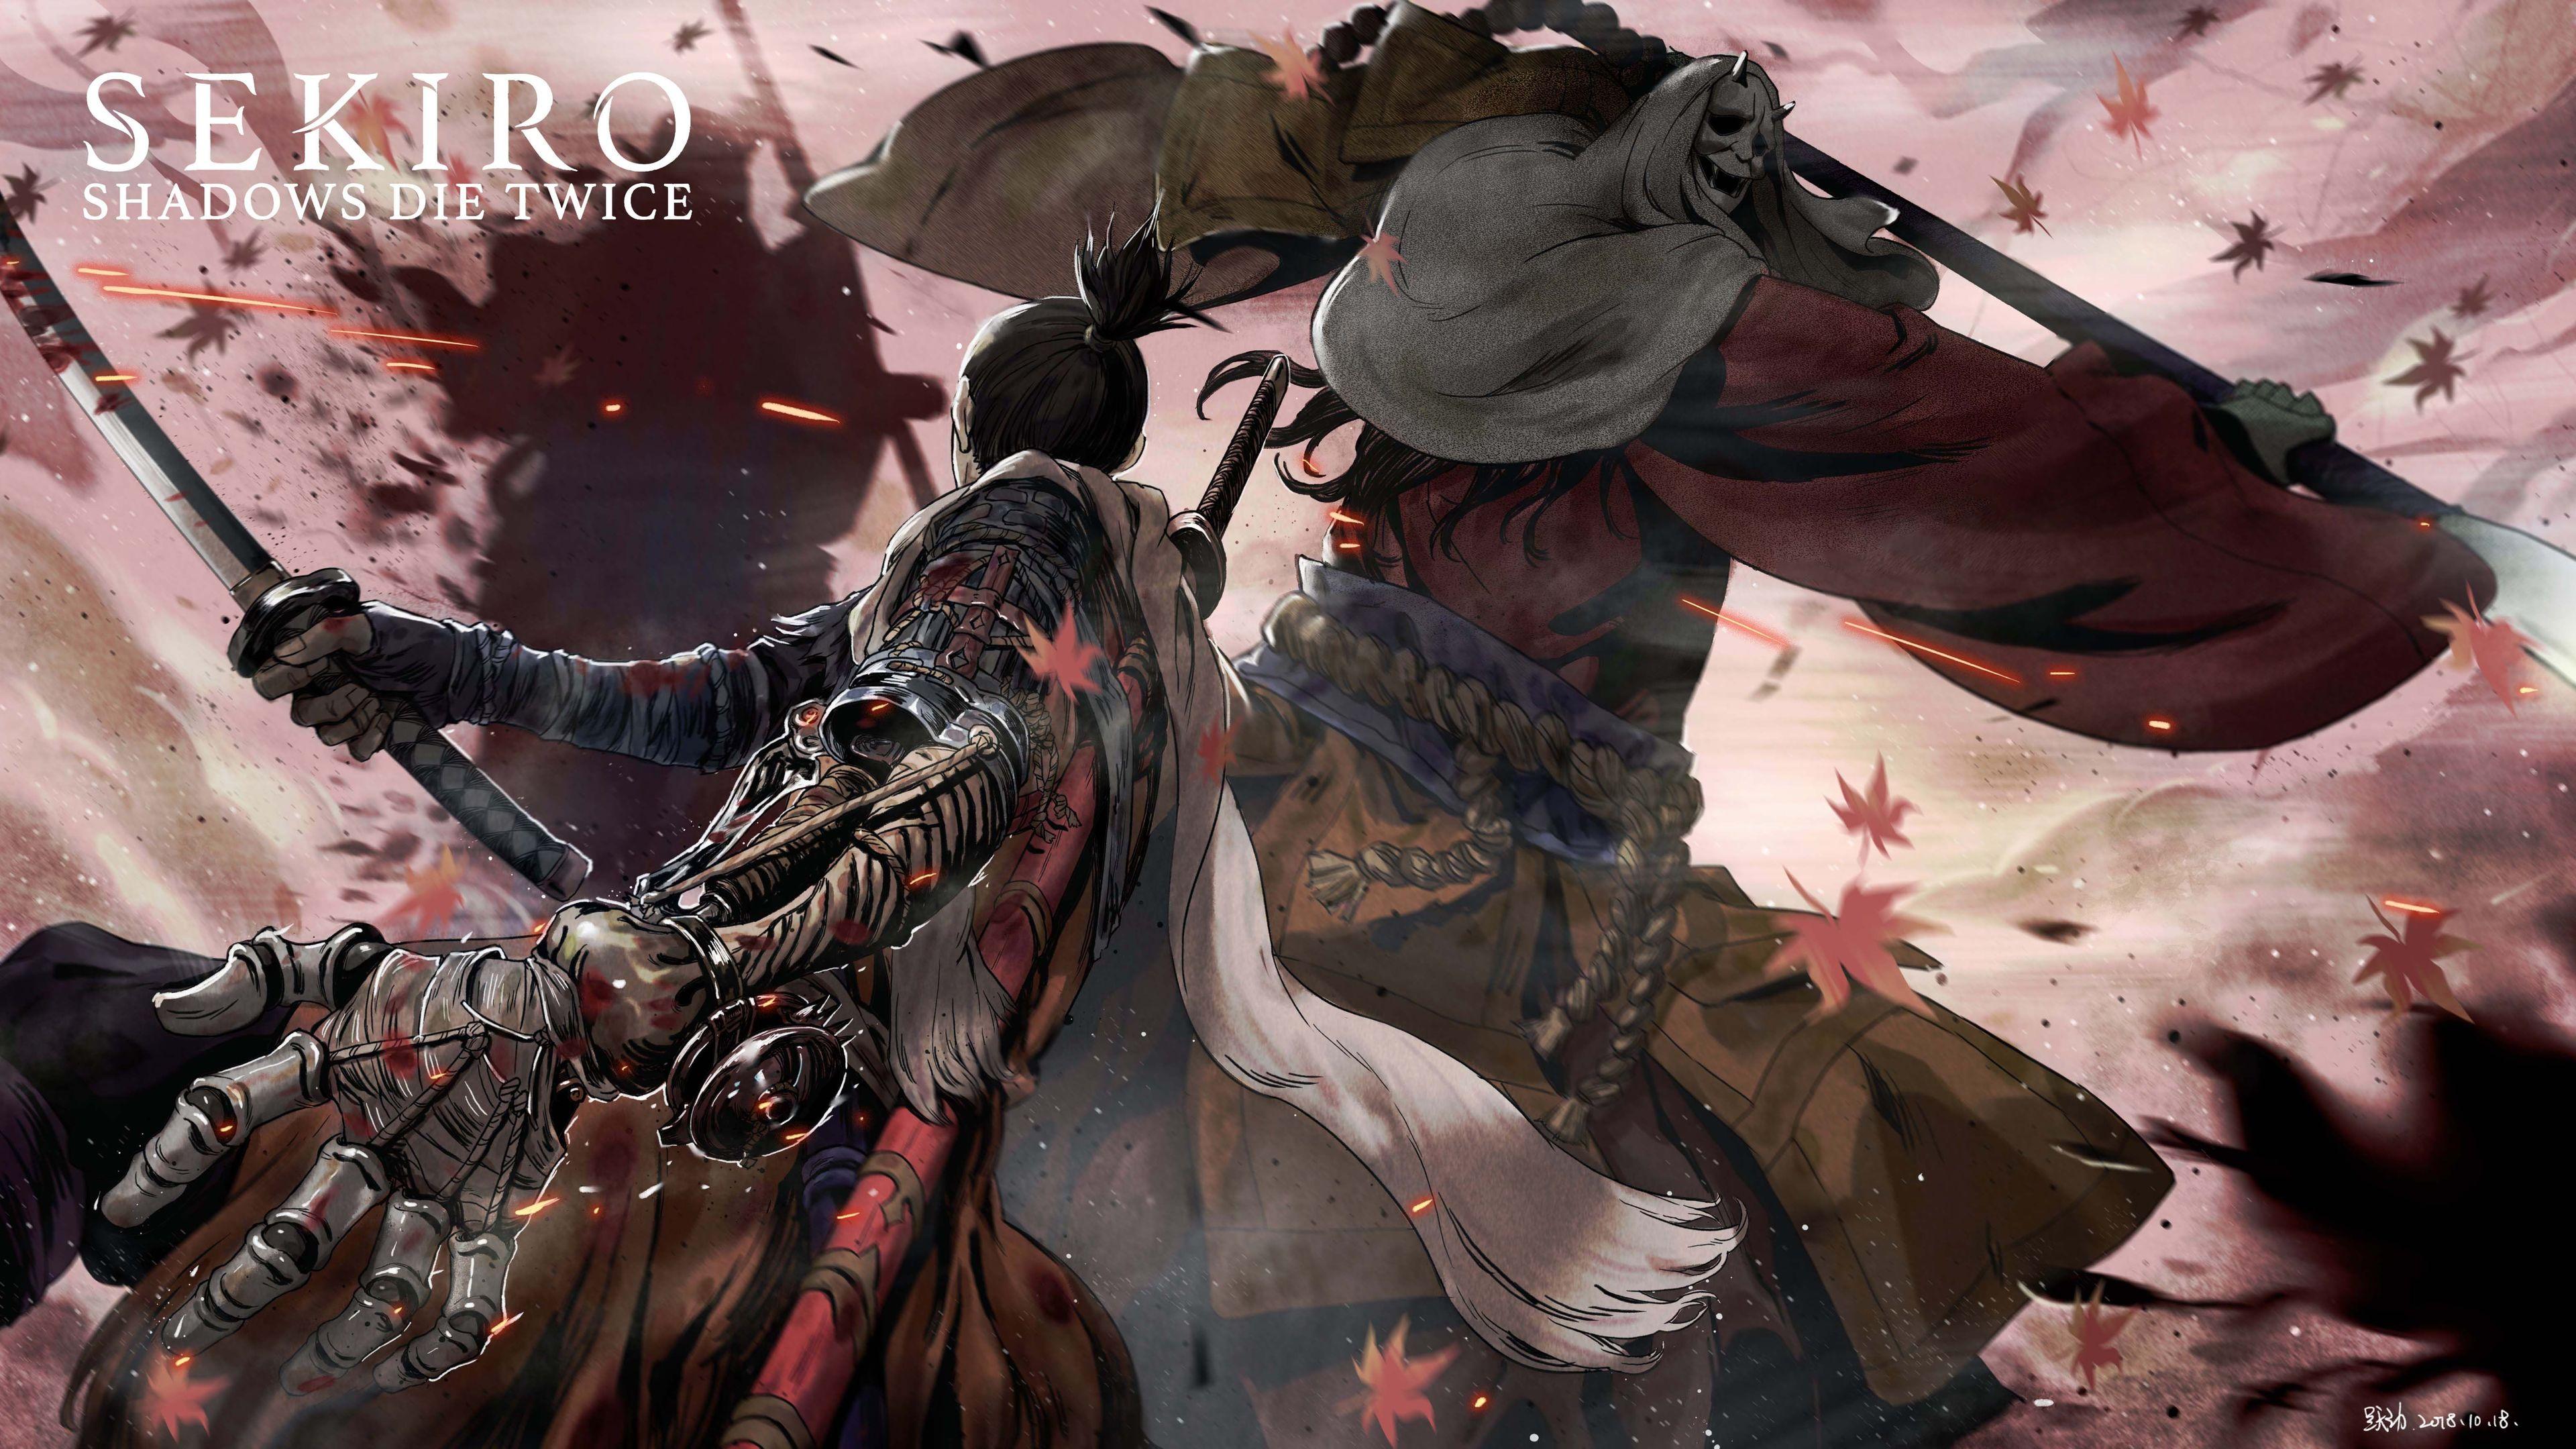 Wallpaper 4k Sekiro Shadows Die Twice 5k 2019 Games Wallpapers 4k